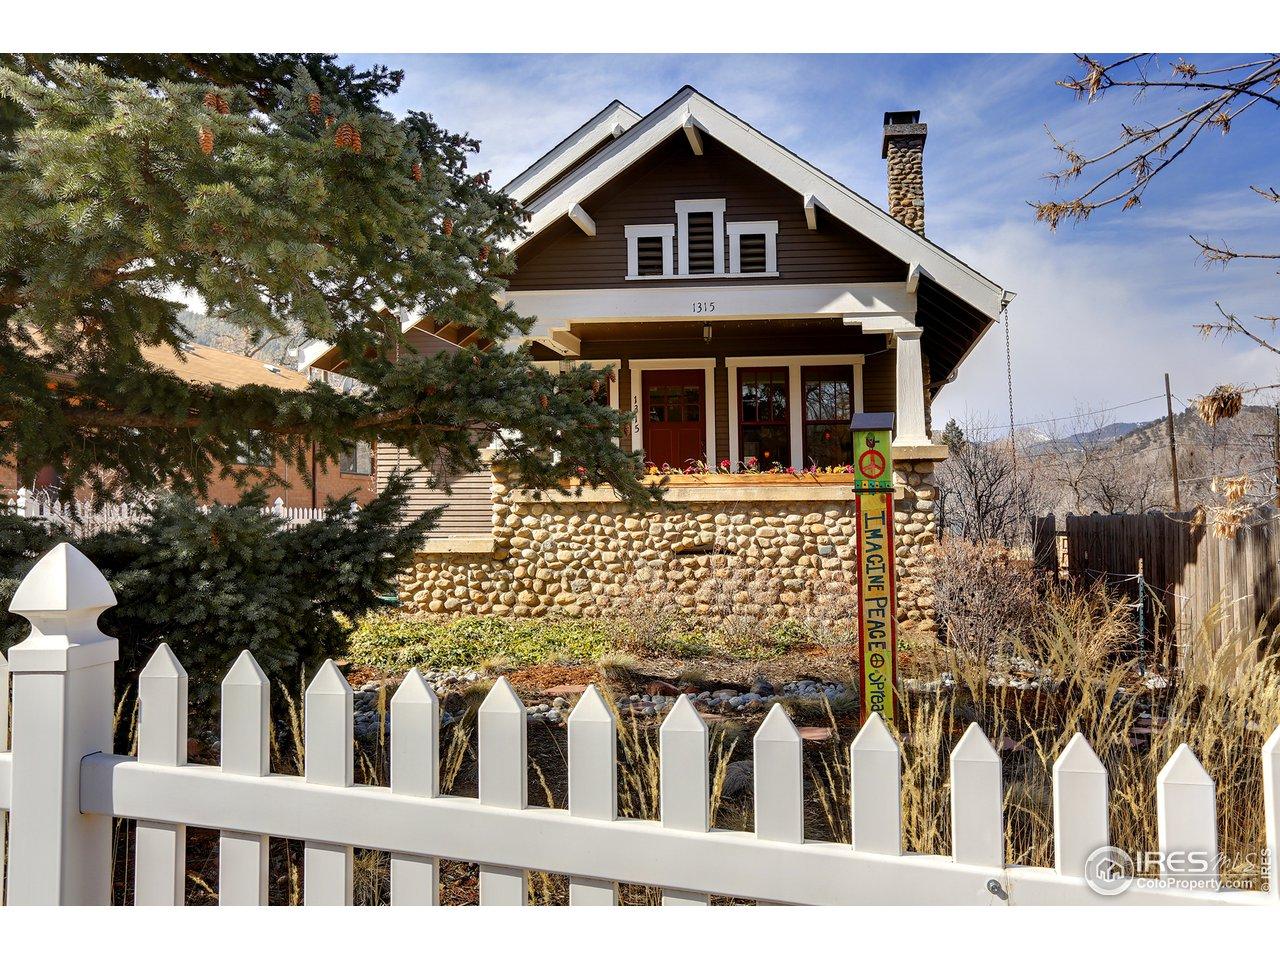 1315 9th St, Boulder CO 80302